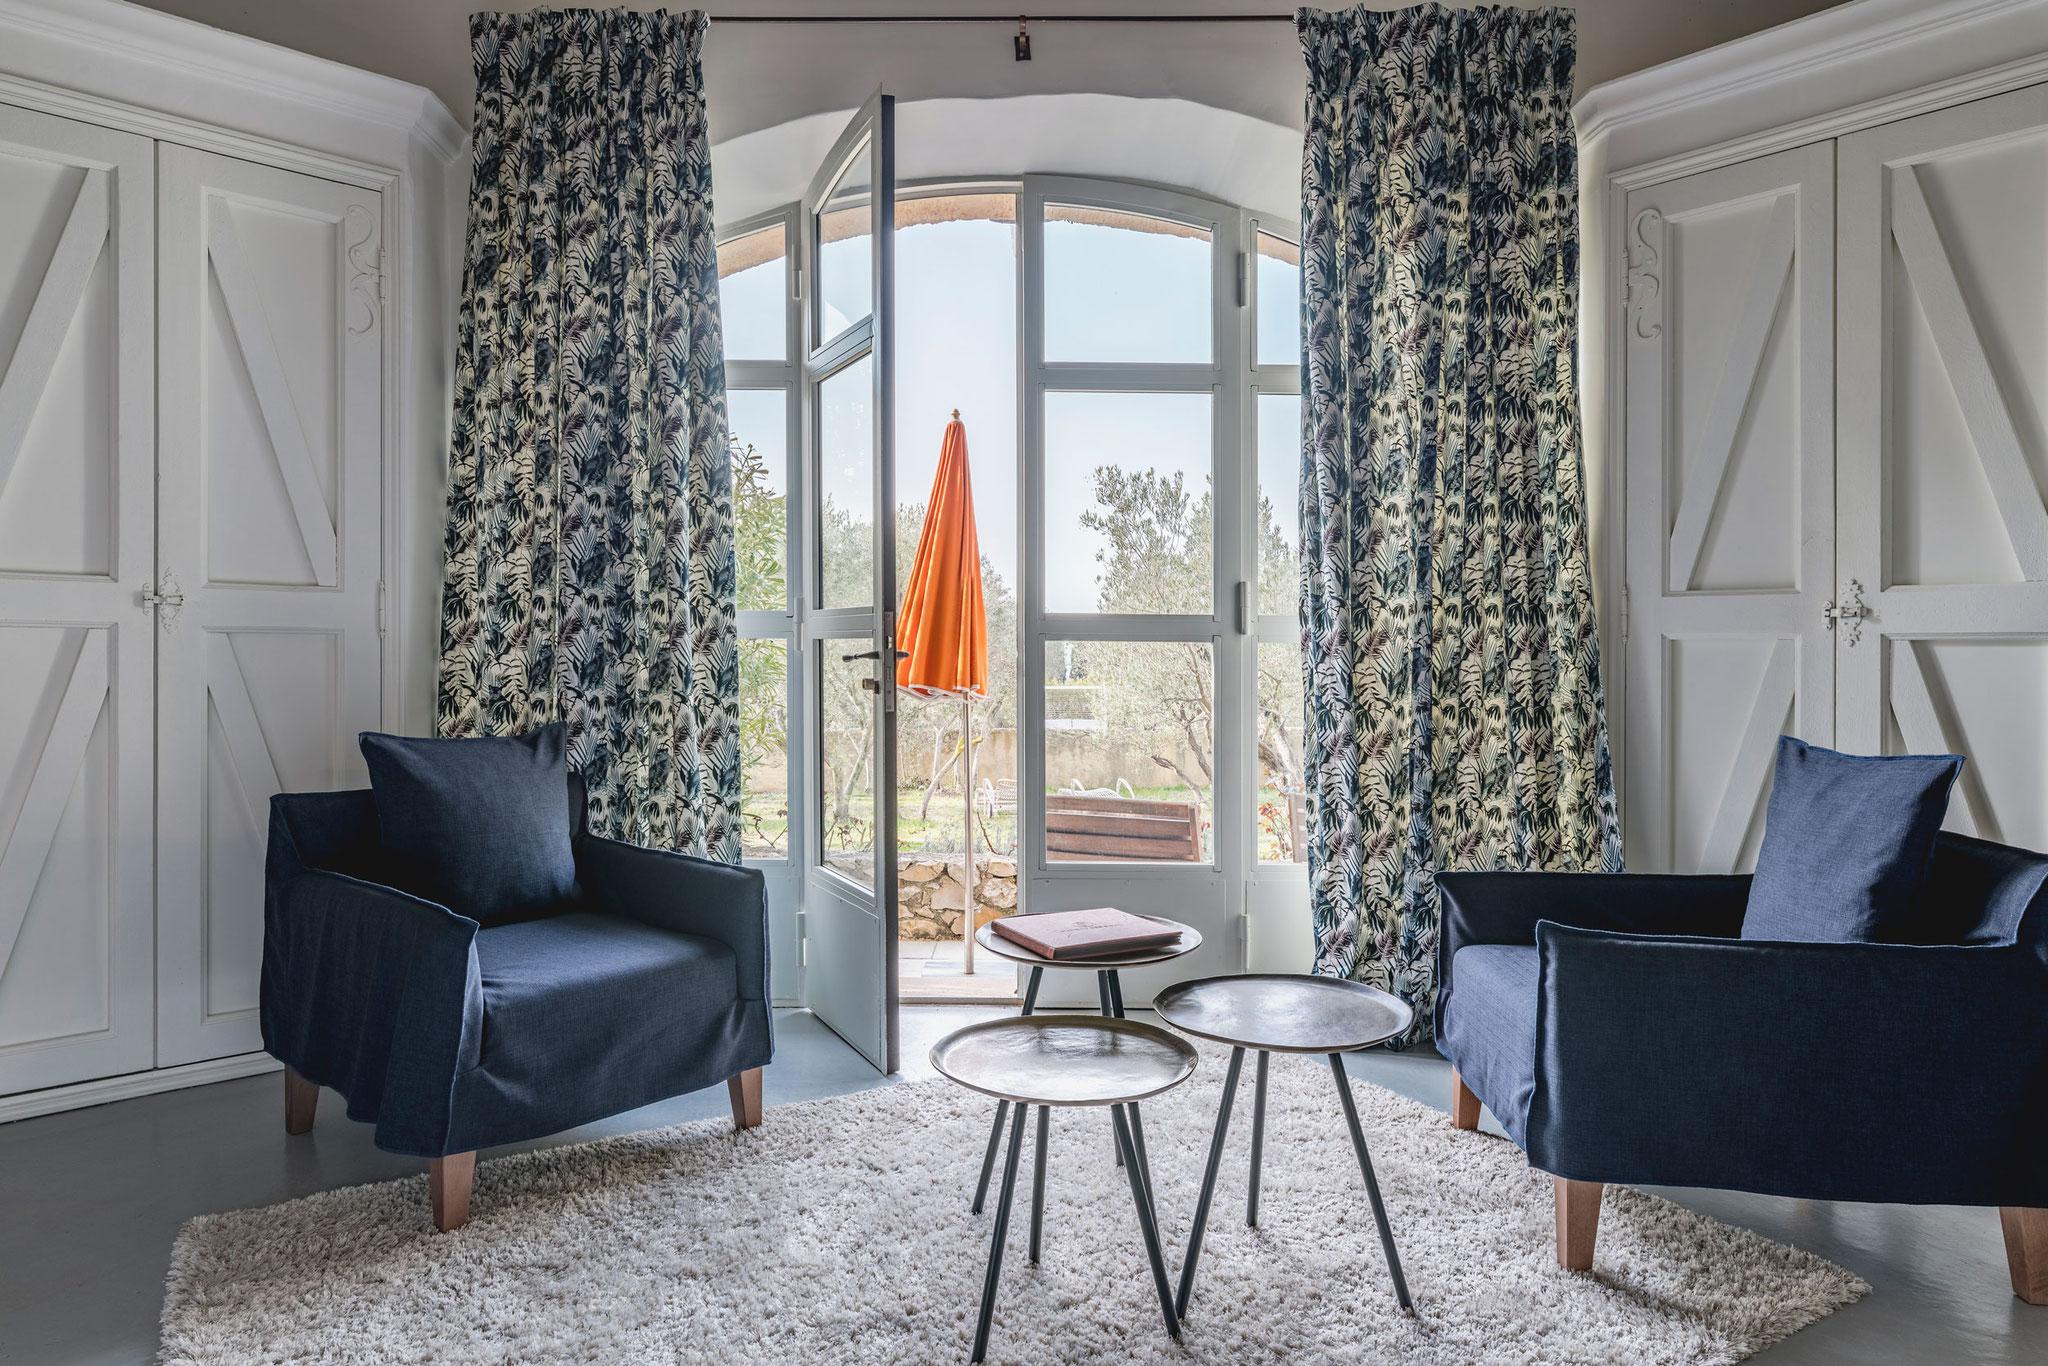 La Calade, Terrace Deluxe Room